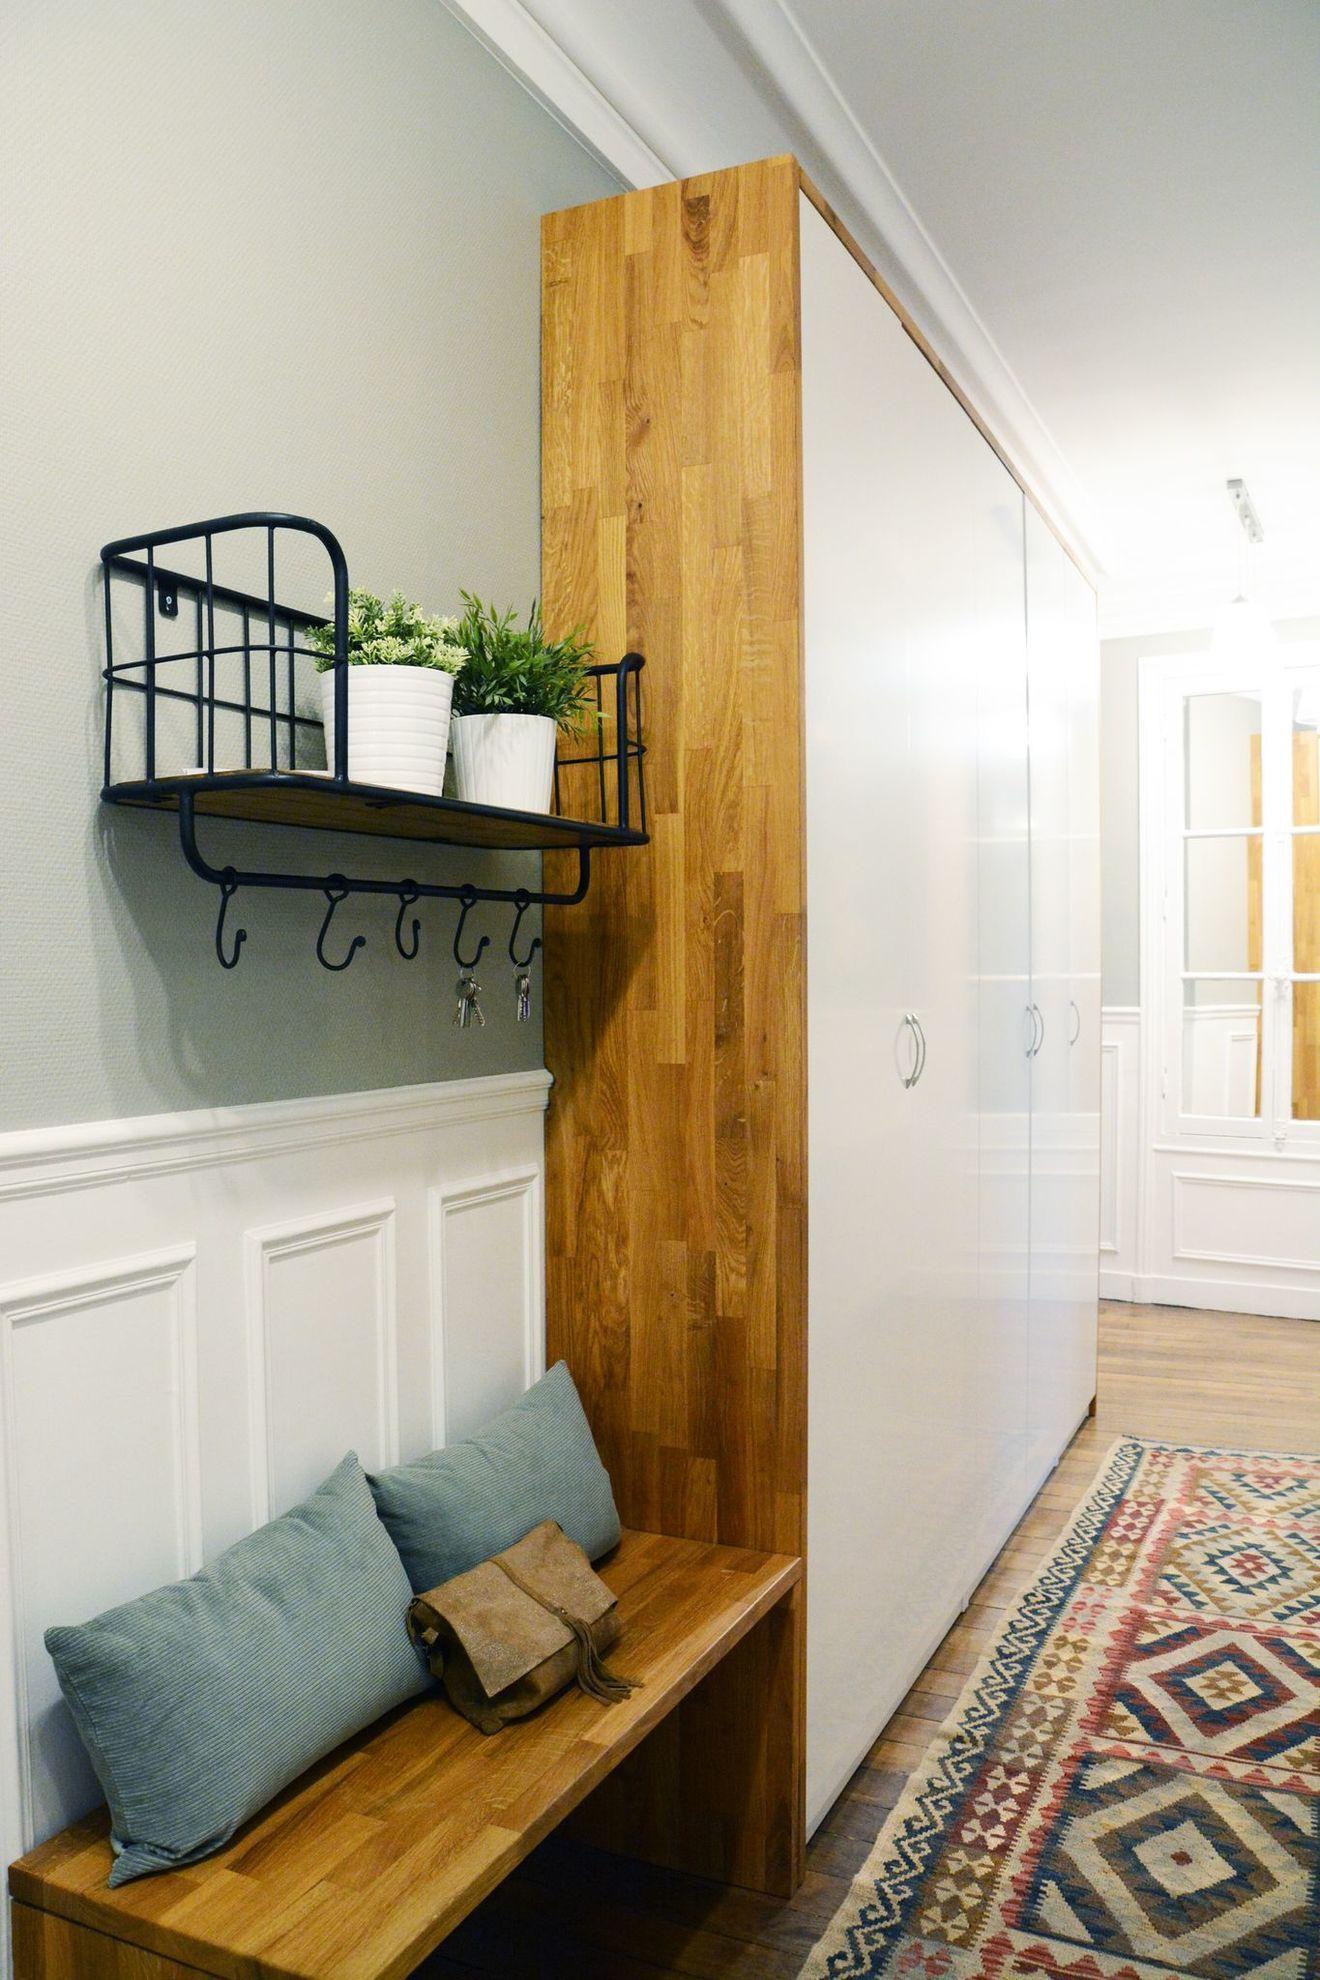 Un Meuble Ikea Customise Habille Le Long Couloir De L Entree Hallwayideas Home Earthy Home Decor Interior